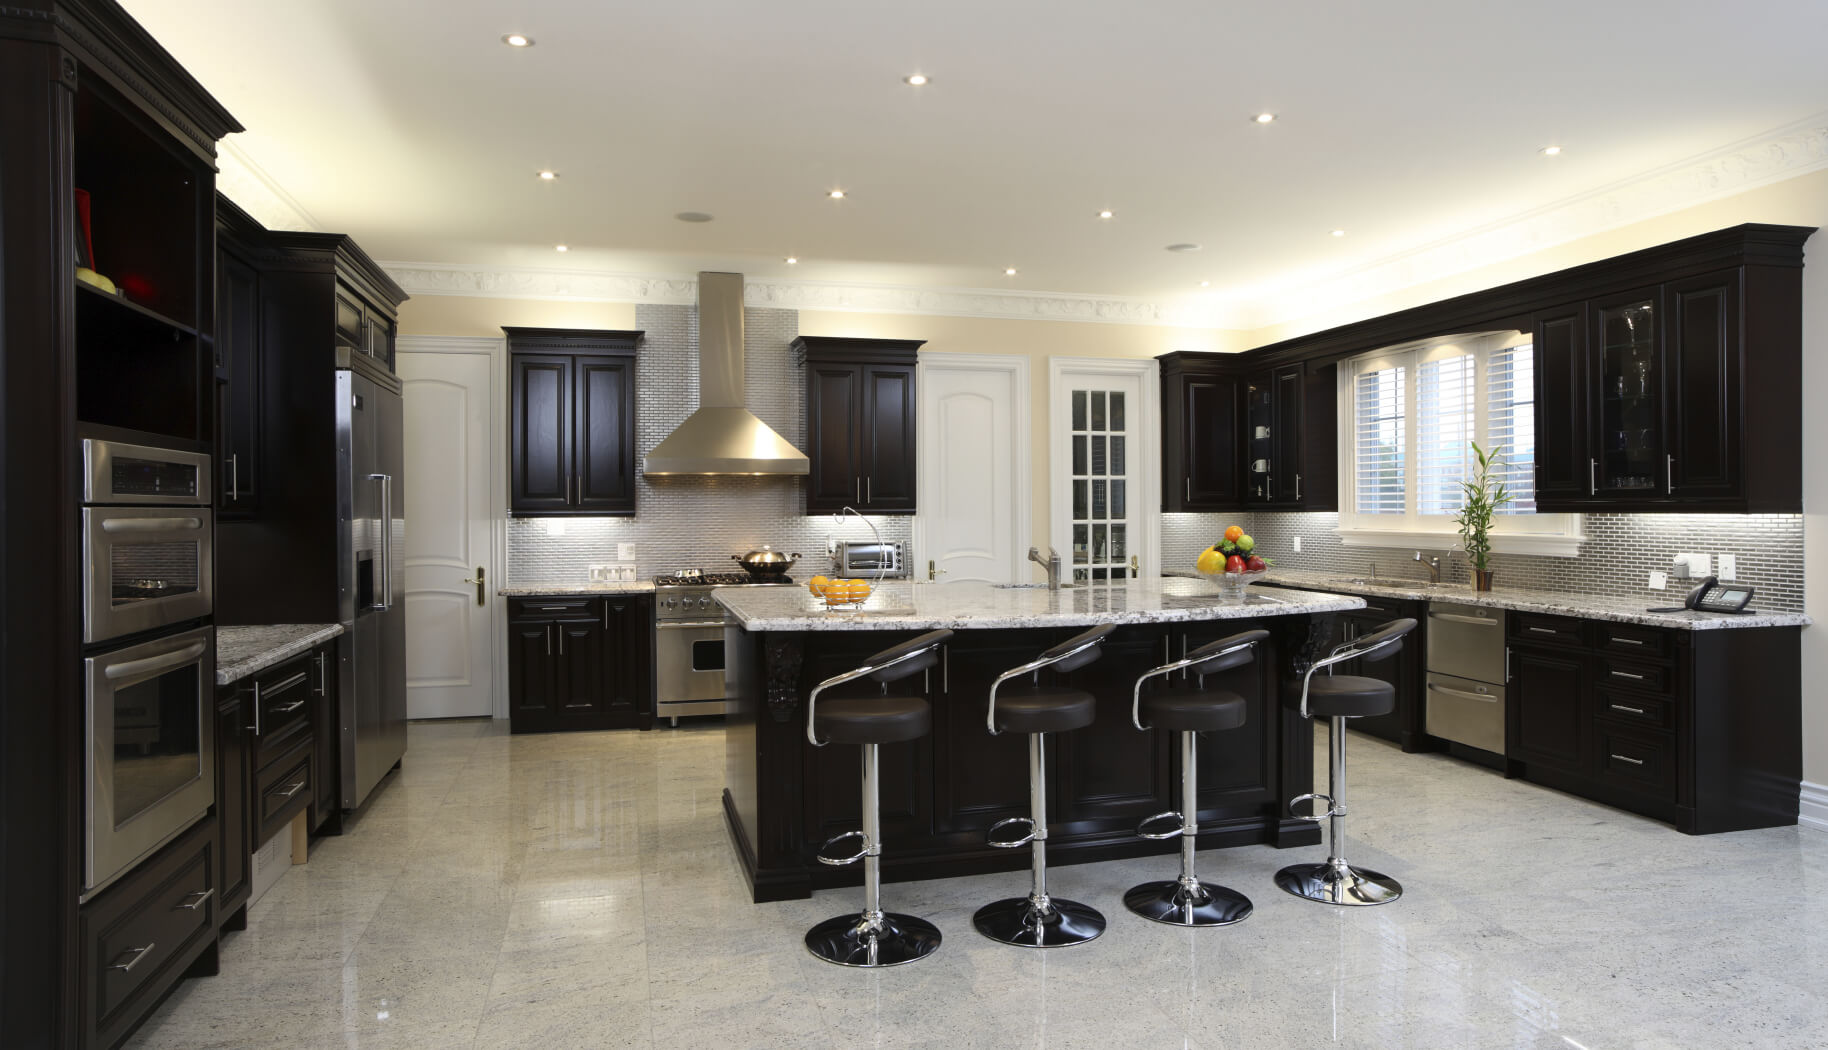 dark kitchen cabinets black kitchen cabinets Spacious modern kitchen with dark cabinetry breakfast bar 4 modern diner style stools and